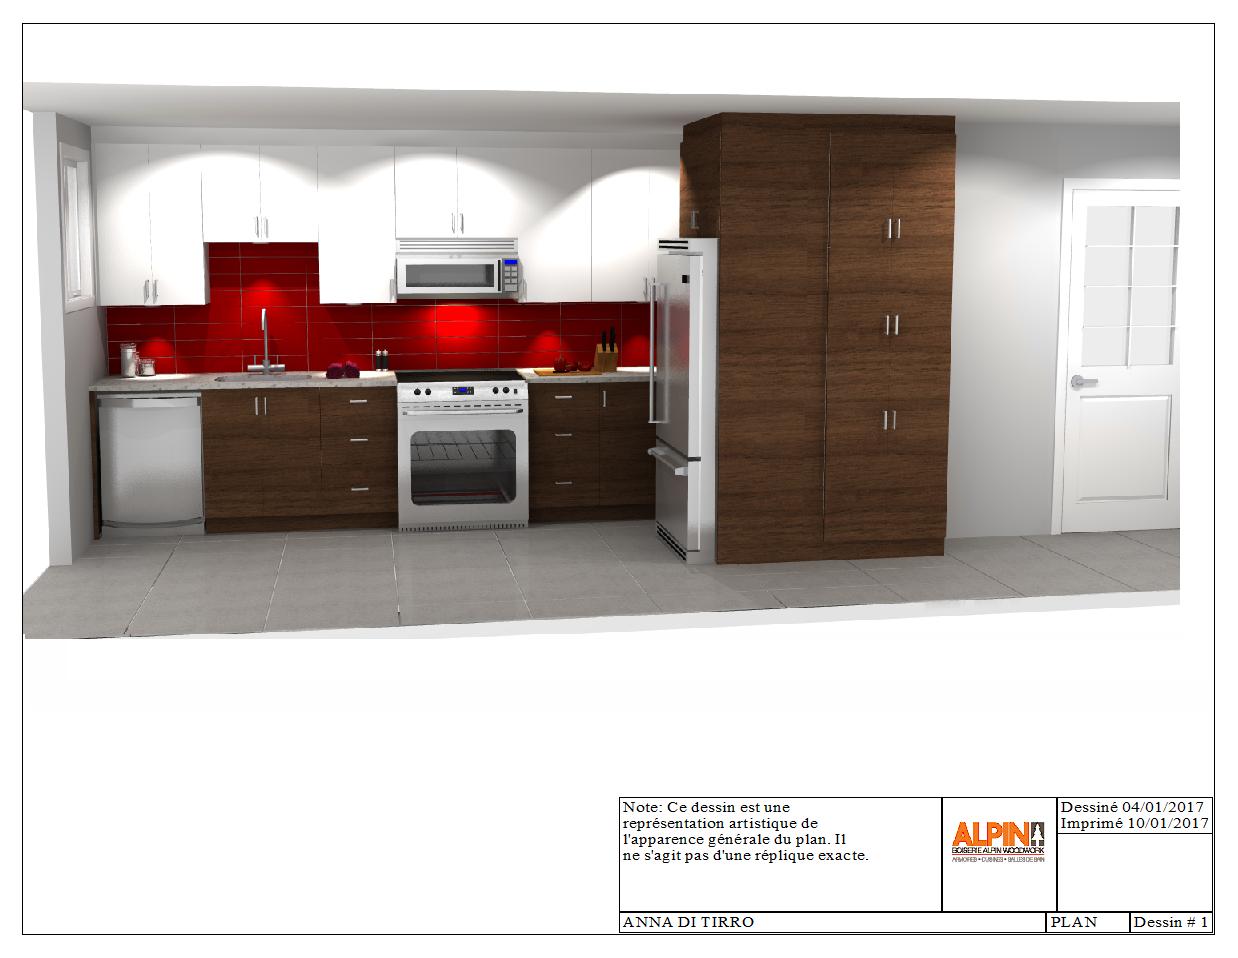 logiciel 3d kitchen design cuisine alpin concept 3d 3d concept alpin pinterest logiciel. Black Bedroom Furniture Sets. Home Design Ideas